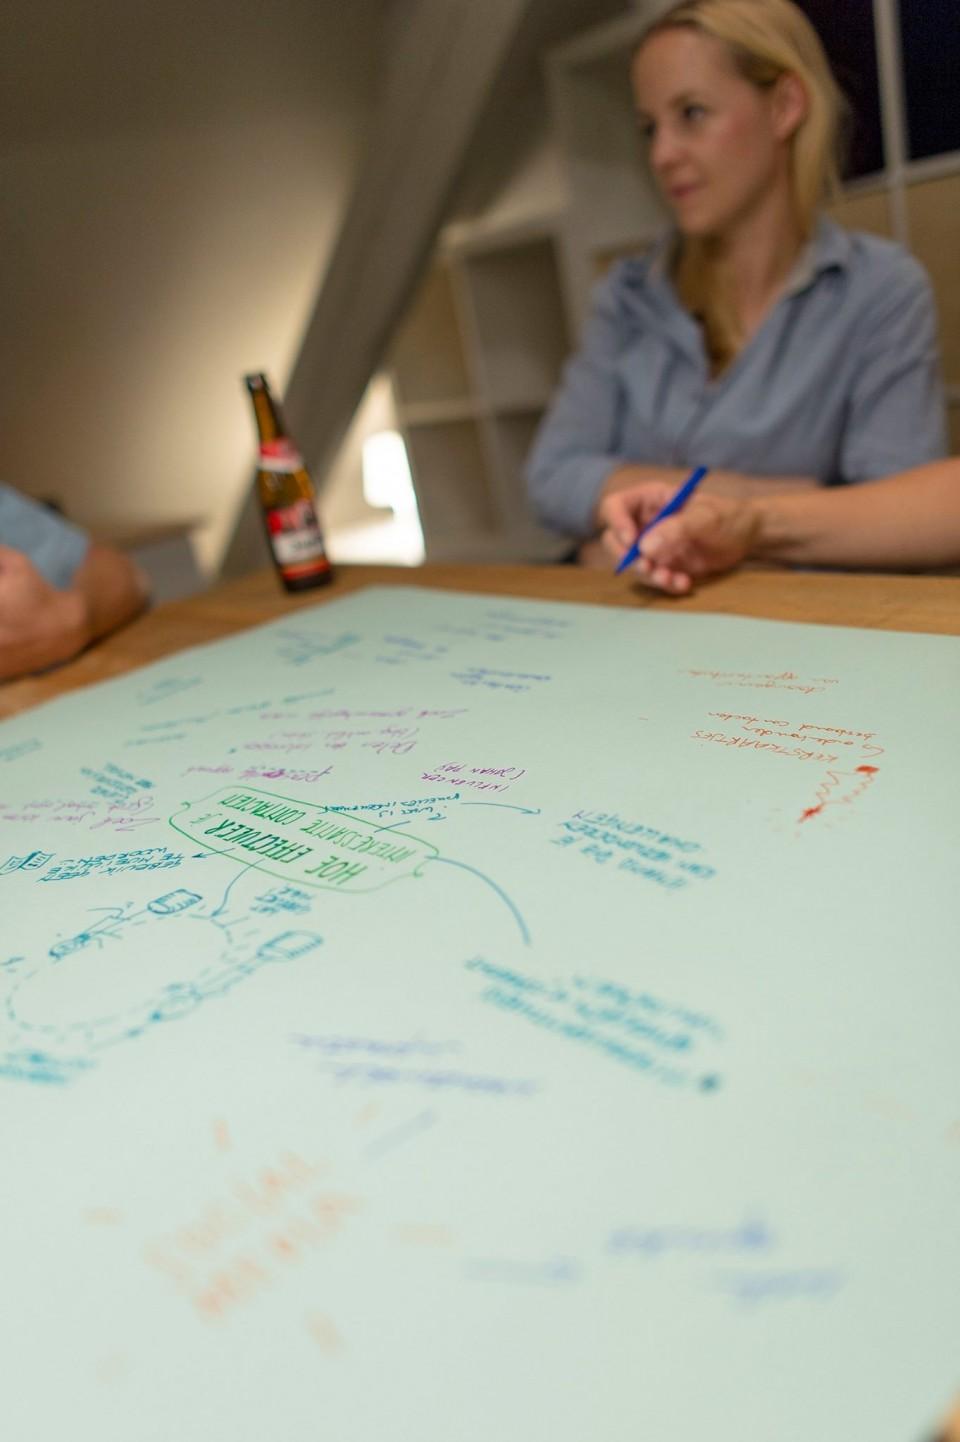 #HDJDN01, brainstorm, cultuur cocktail, studio wasabi, house of ape